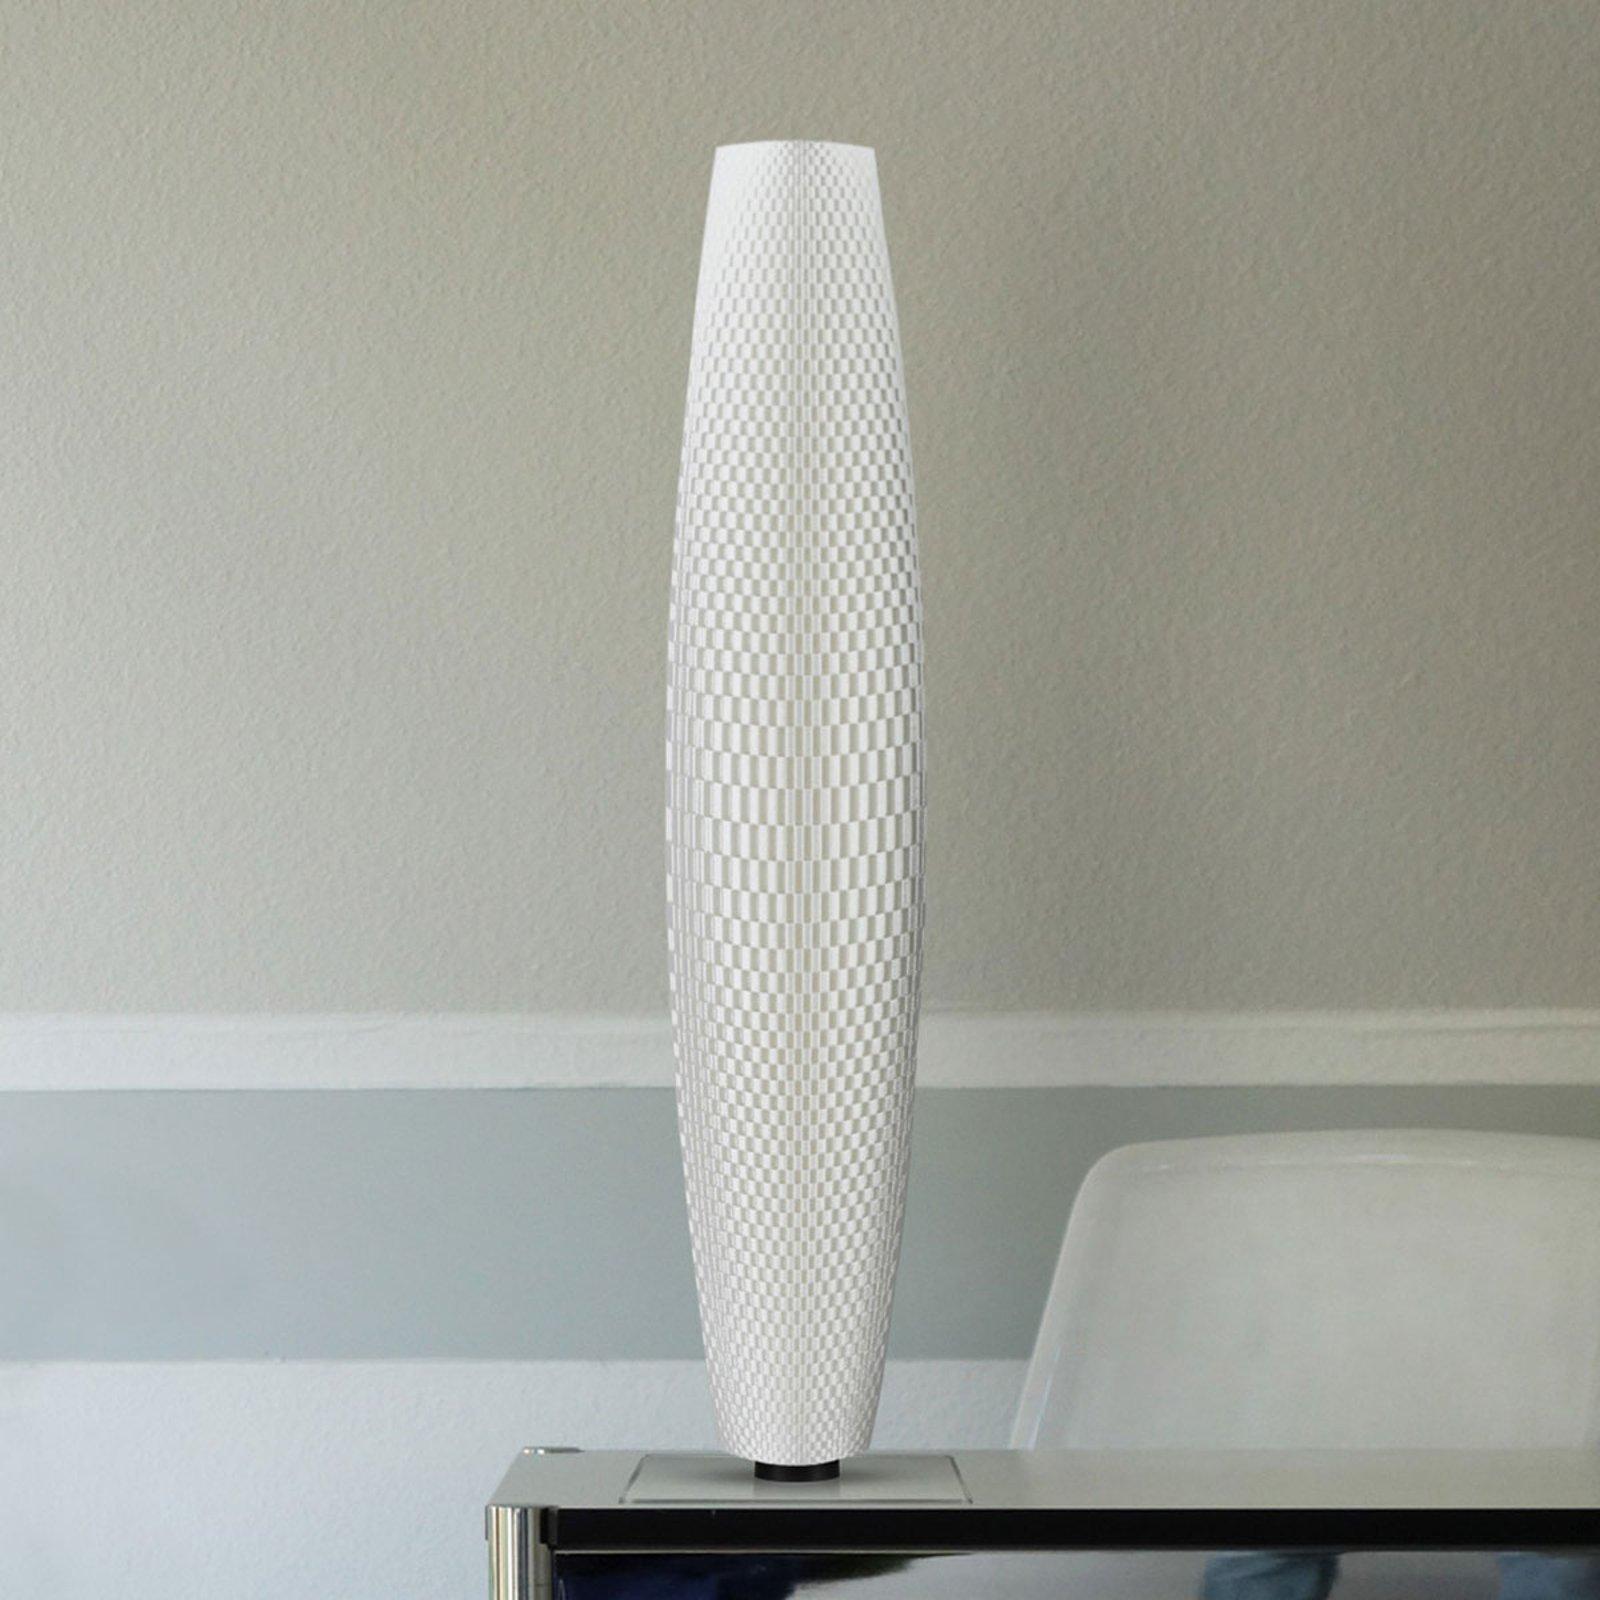 LED-gulvlampe Flechtwerk Pur hvit 75 cm